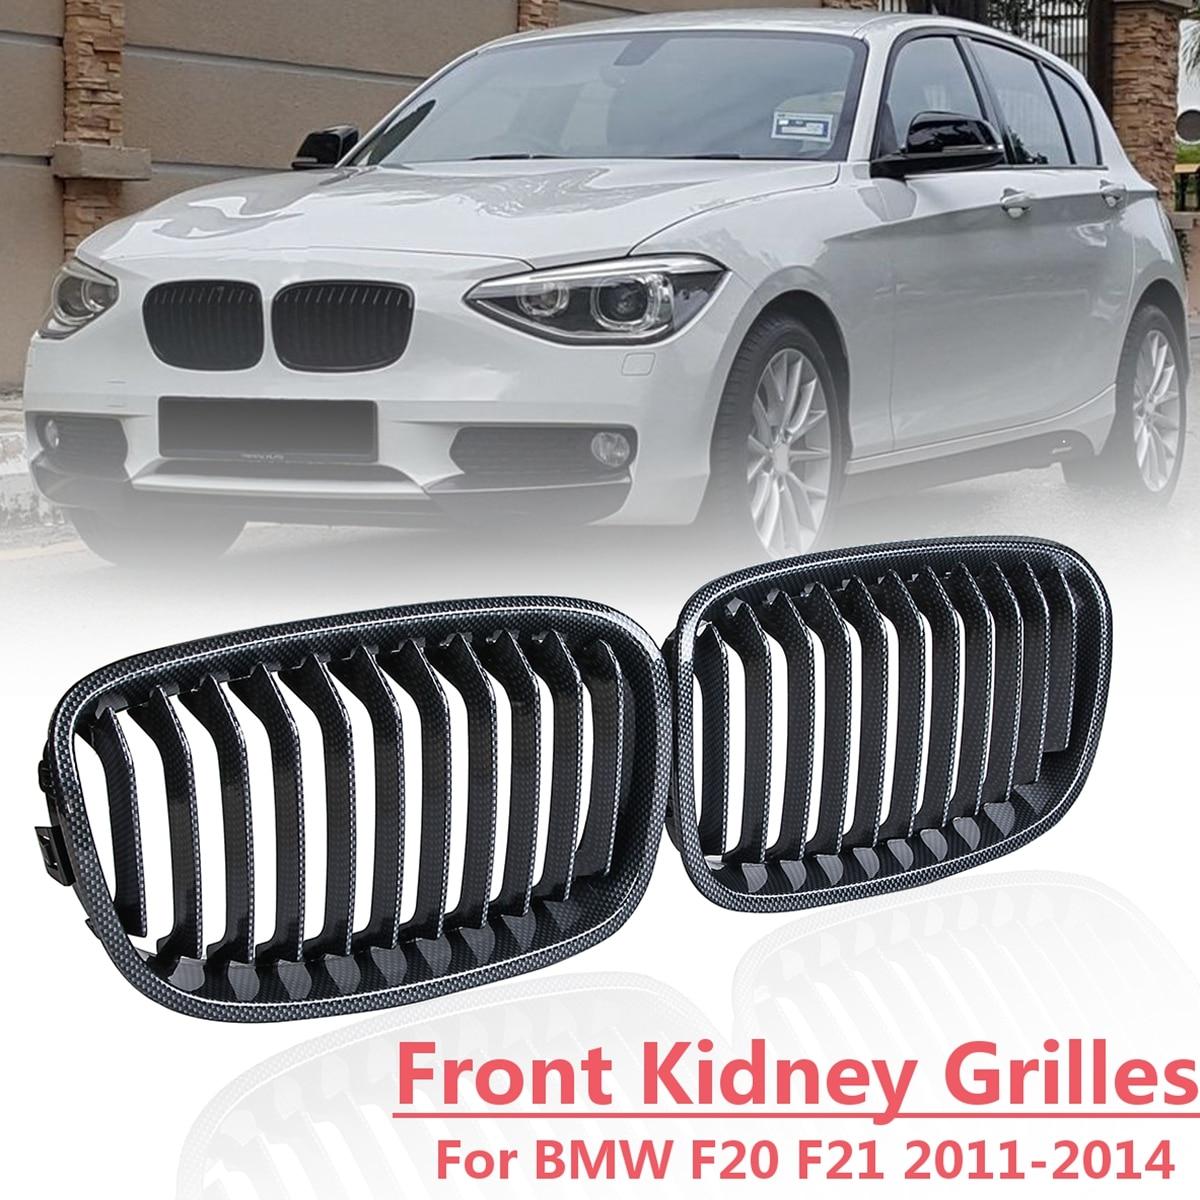 1 Pair Front Bumper Racing Grill for BMW F20 F21 114i 116i Hatchback 2011 2012 2013 2014 Carbon Fiber Kidney Grill Grilles 2pcs front grille bumper hood grill grilles automobile front kidney grille for bmw 1 series f20 2012 2014 glossy black